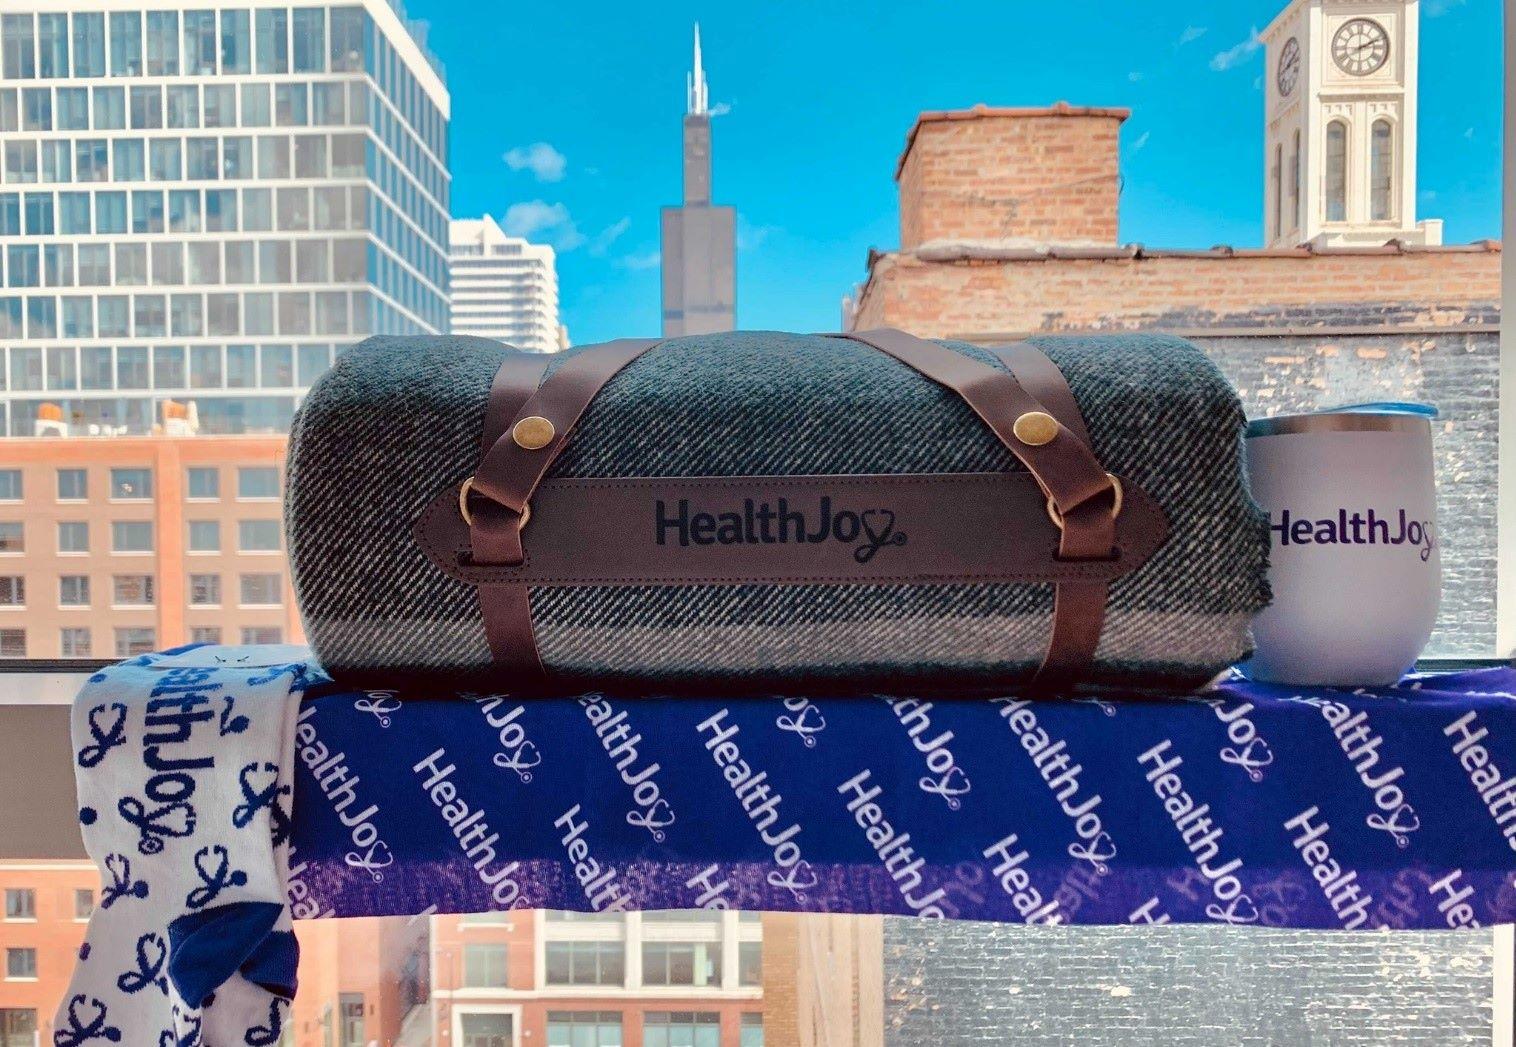 HealthJoy headquarter office in Chicago